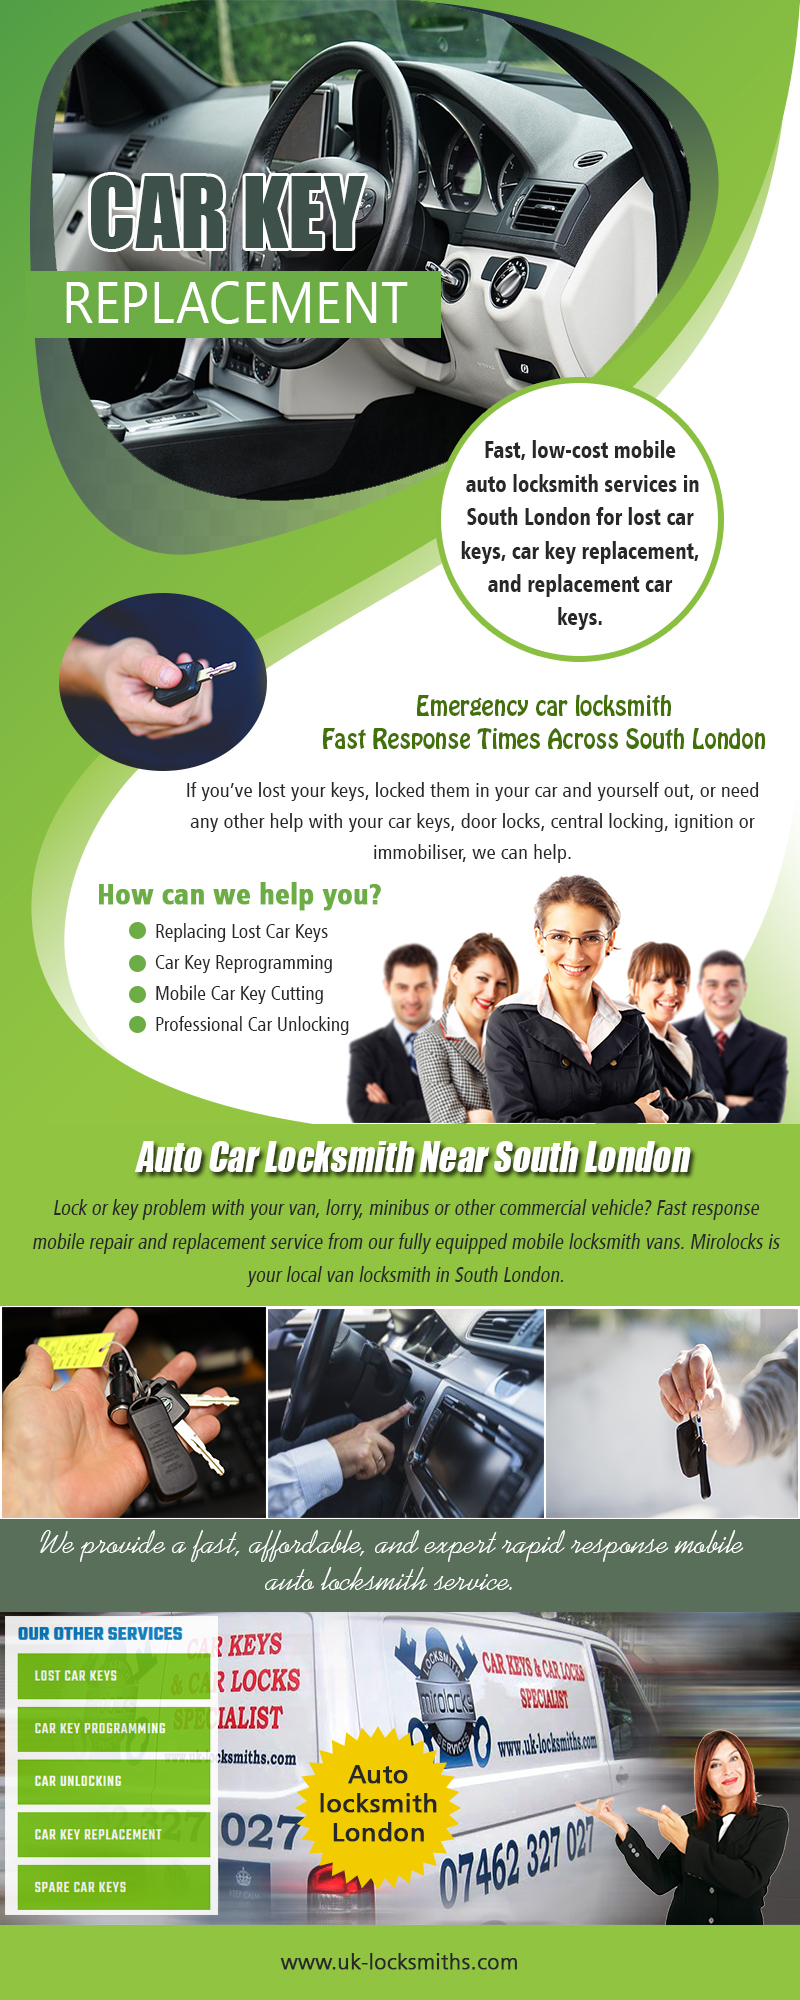 Car Key Replacement Near Me | Call – 07462 327 027 | uk-locksmiths.com